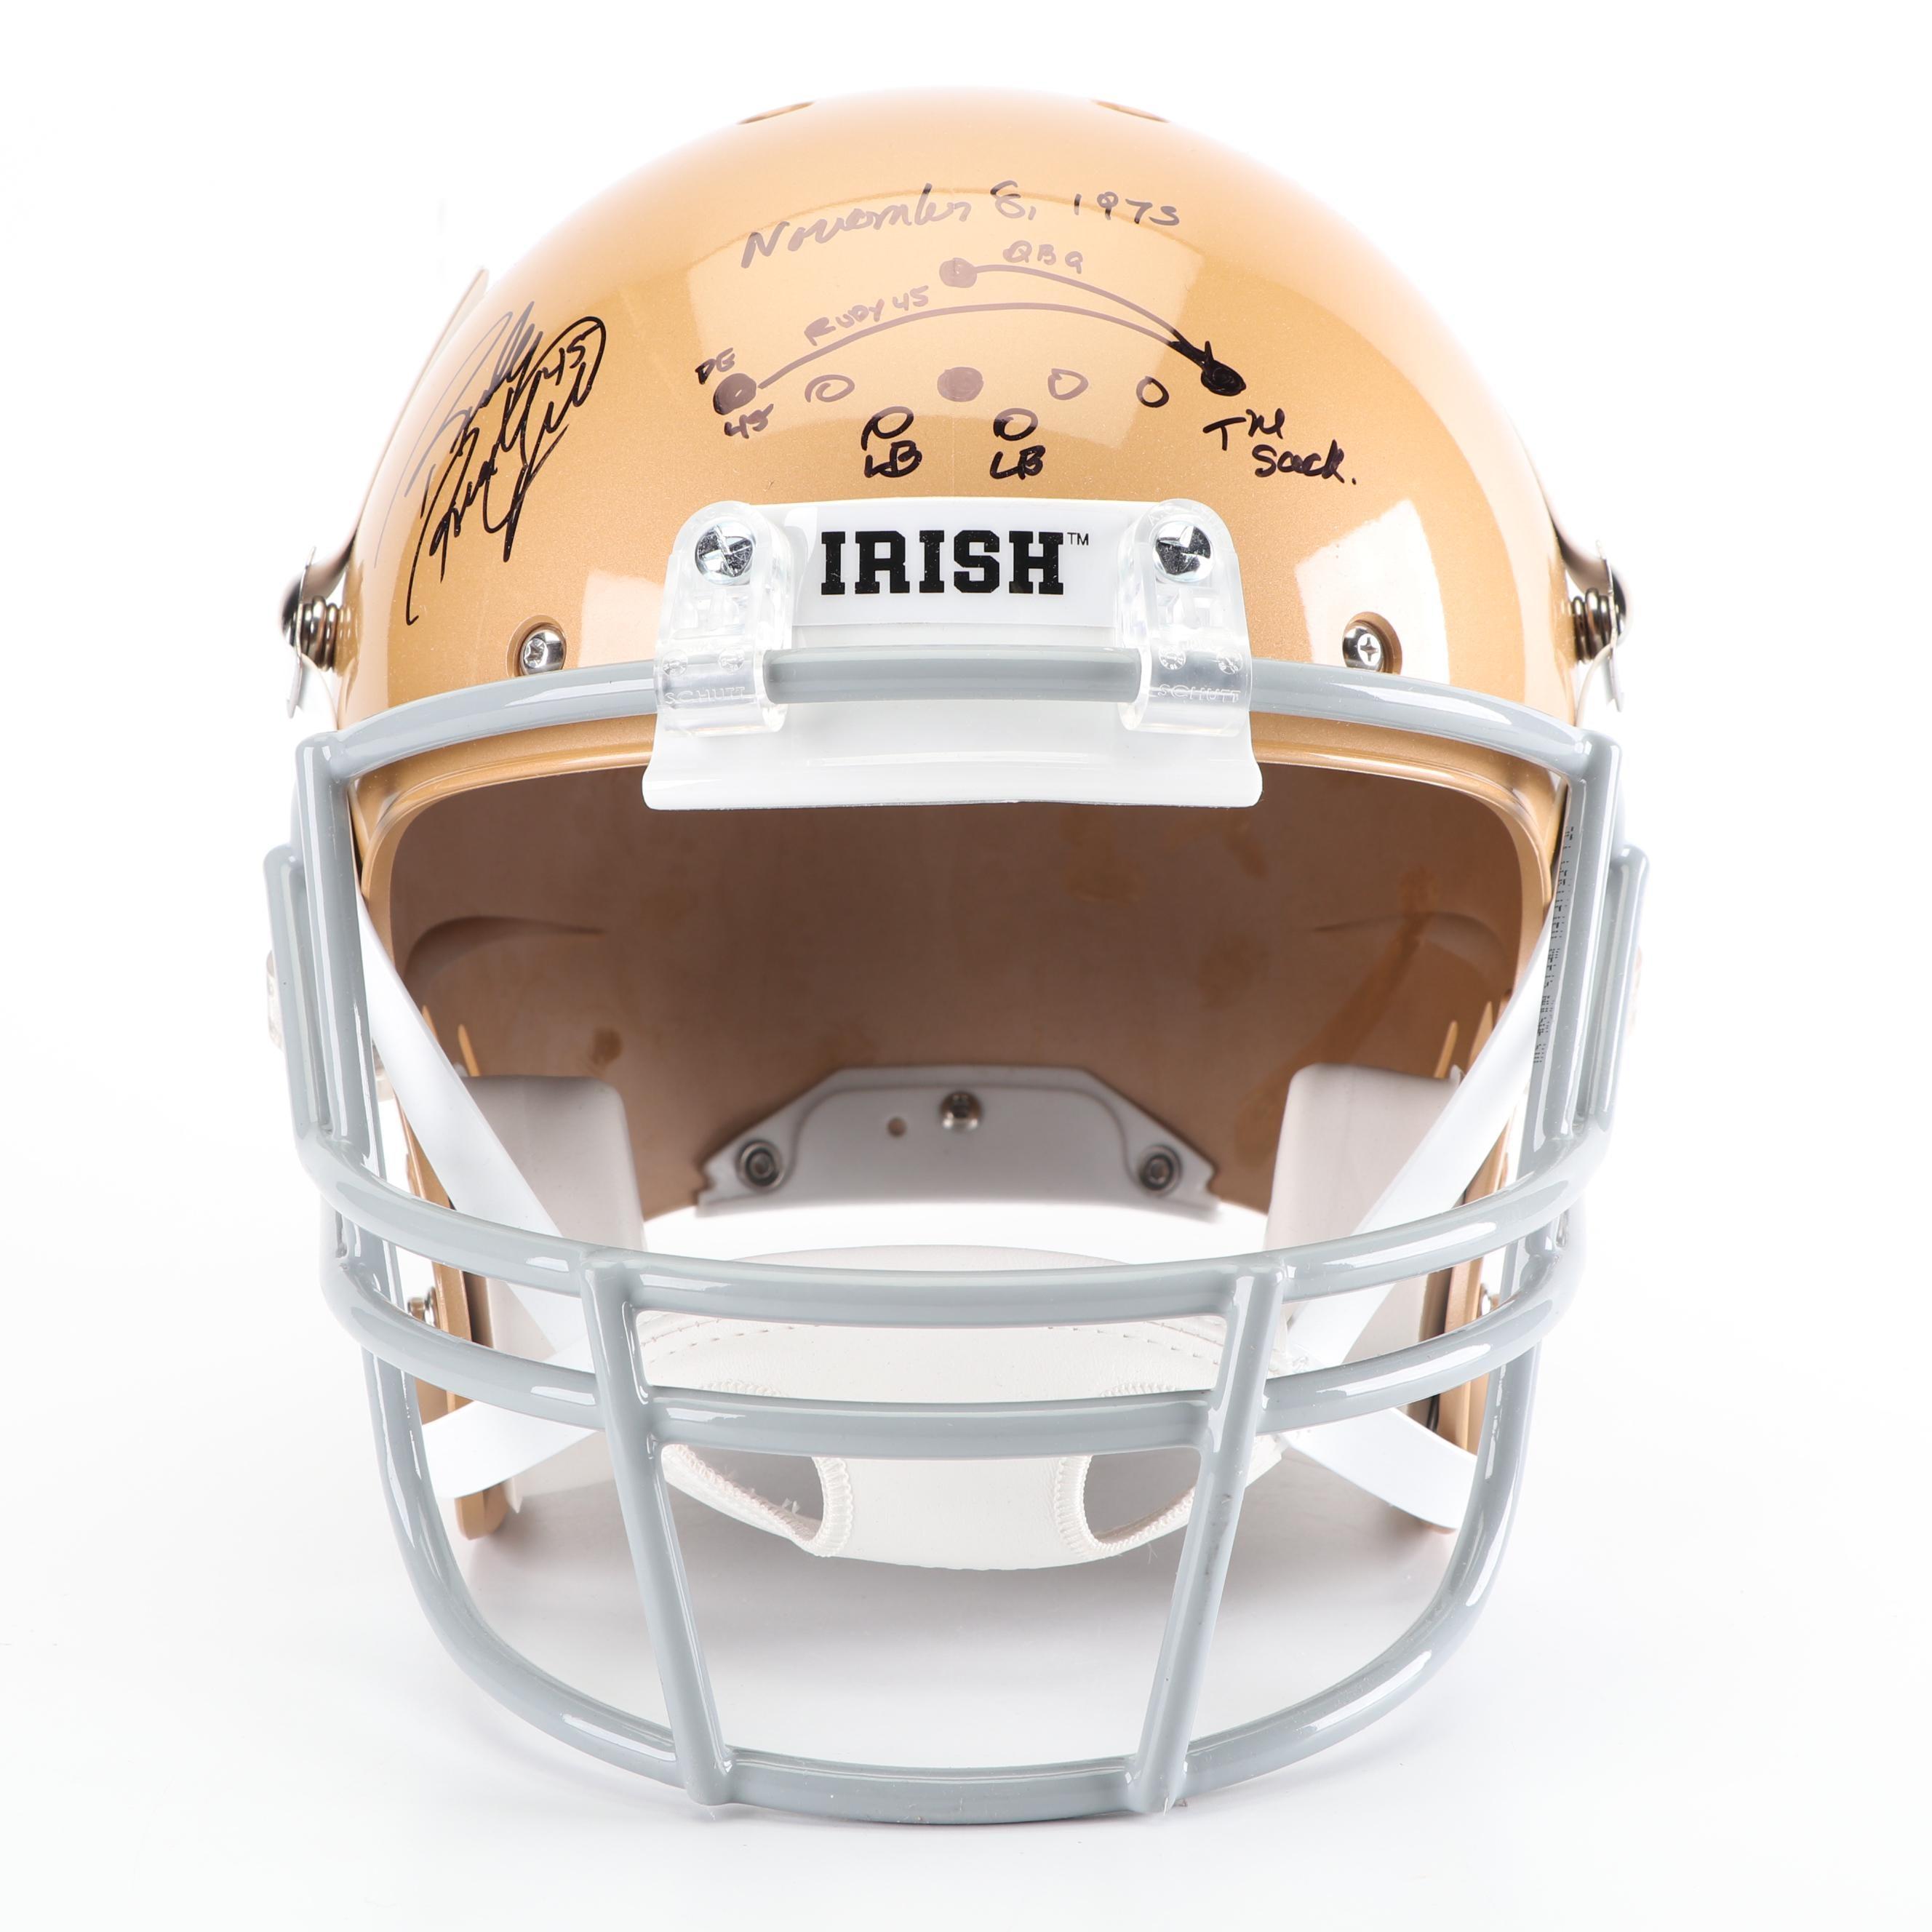 "Rudy Ruettiger Autographed Replica Helmet with ""The Sack"" Play Diagram - JSA COA"